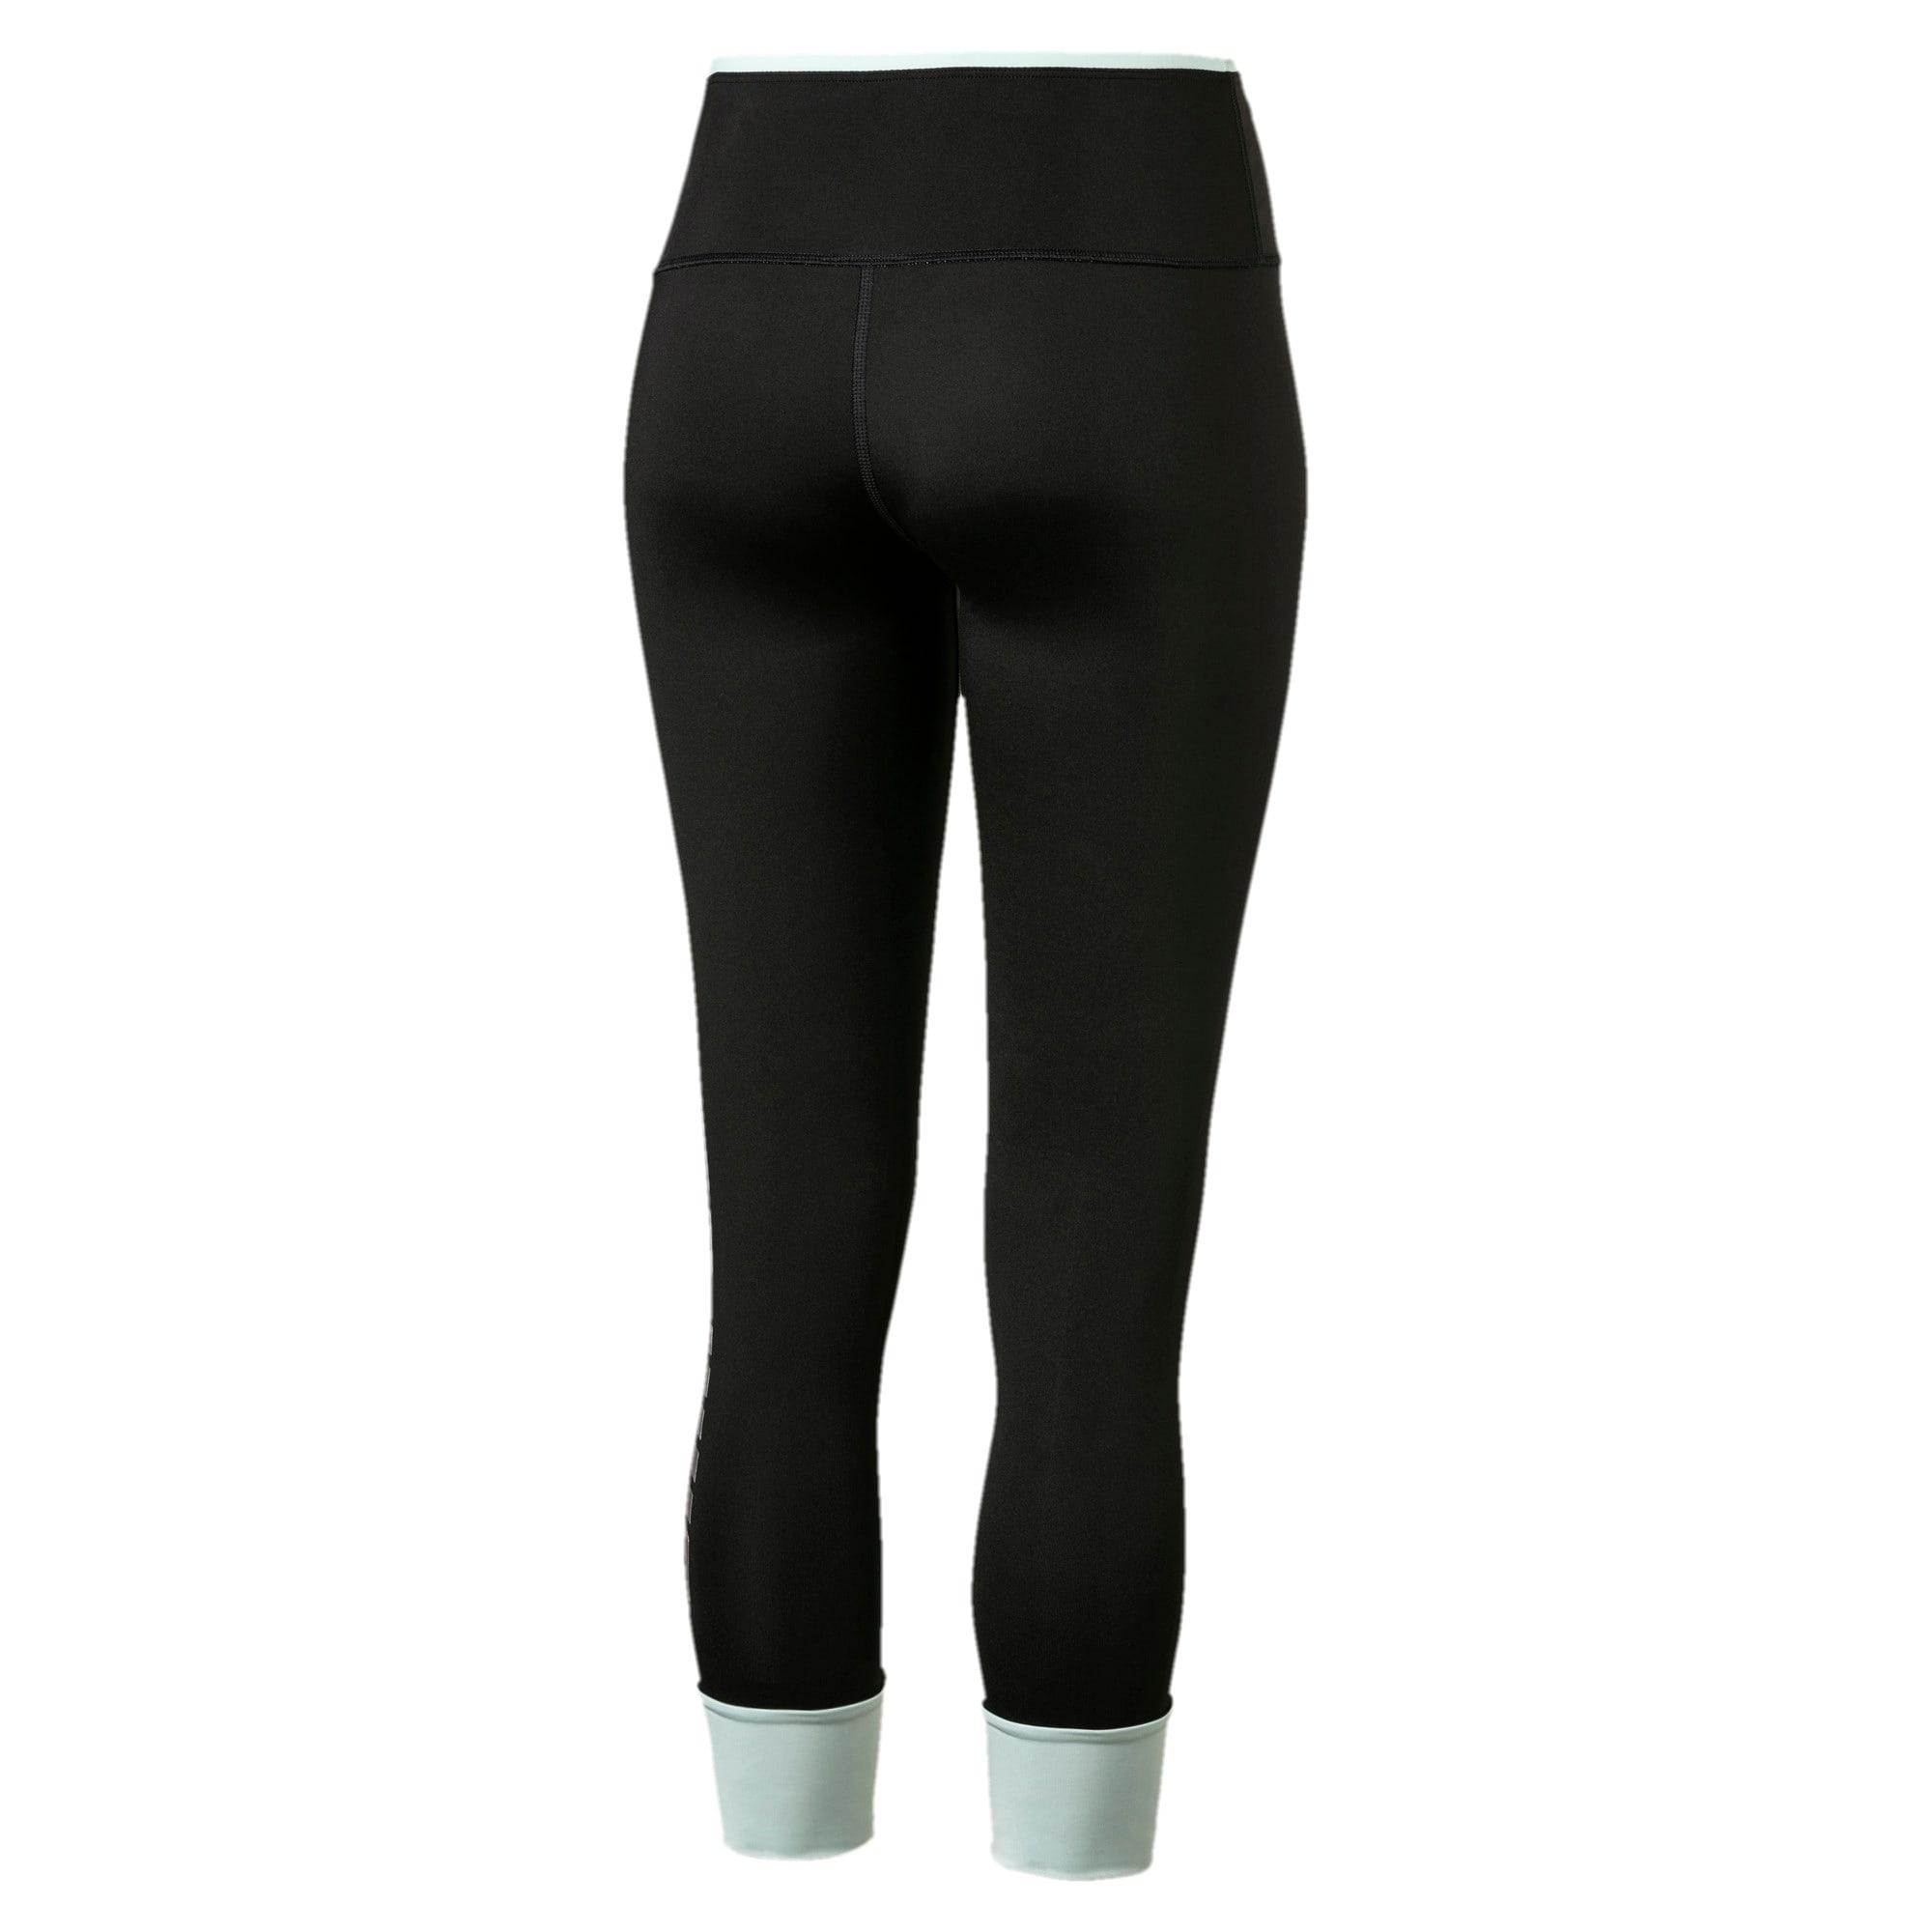 Thumbnail 5 of Modern Sports Fold Up Women's Leggings, Puma Black-fair aqua silver, medium